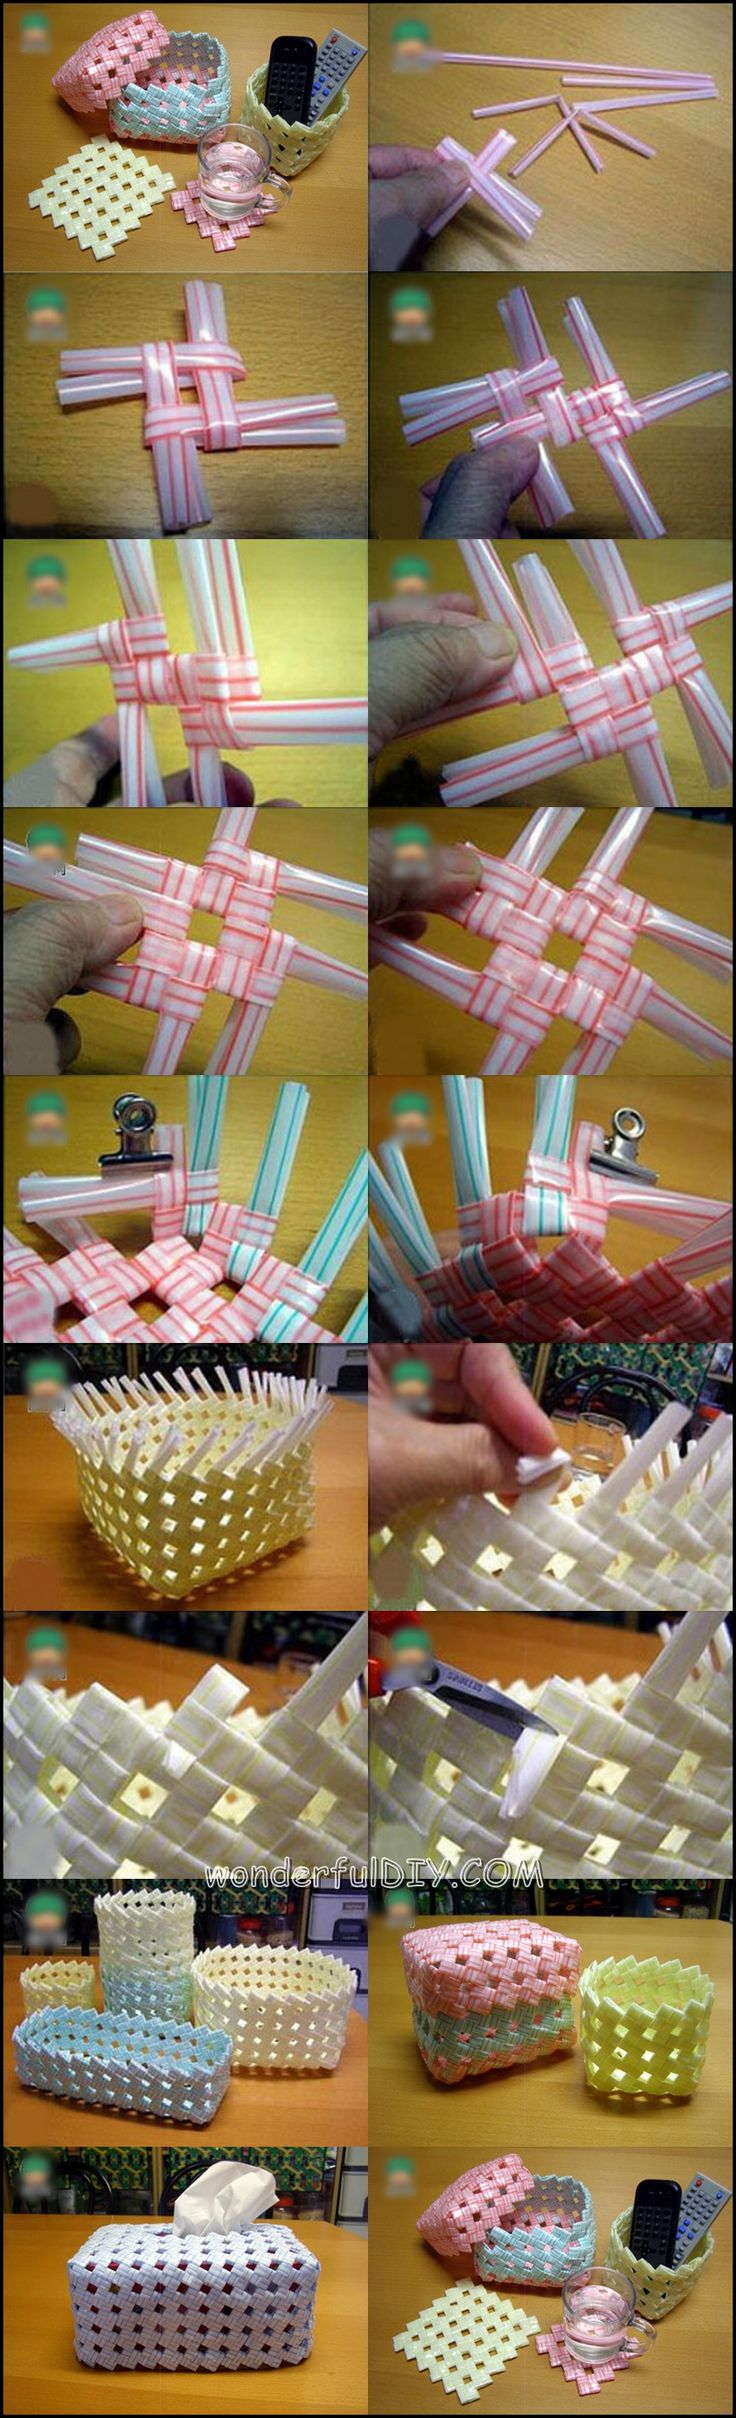 DIY Creative Drinking Straw Basket. See the tutorial